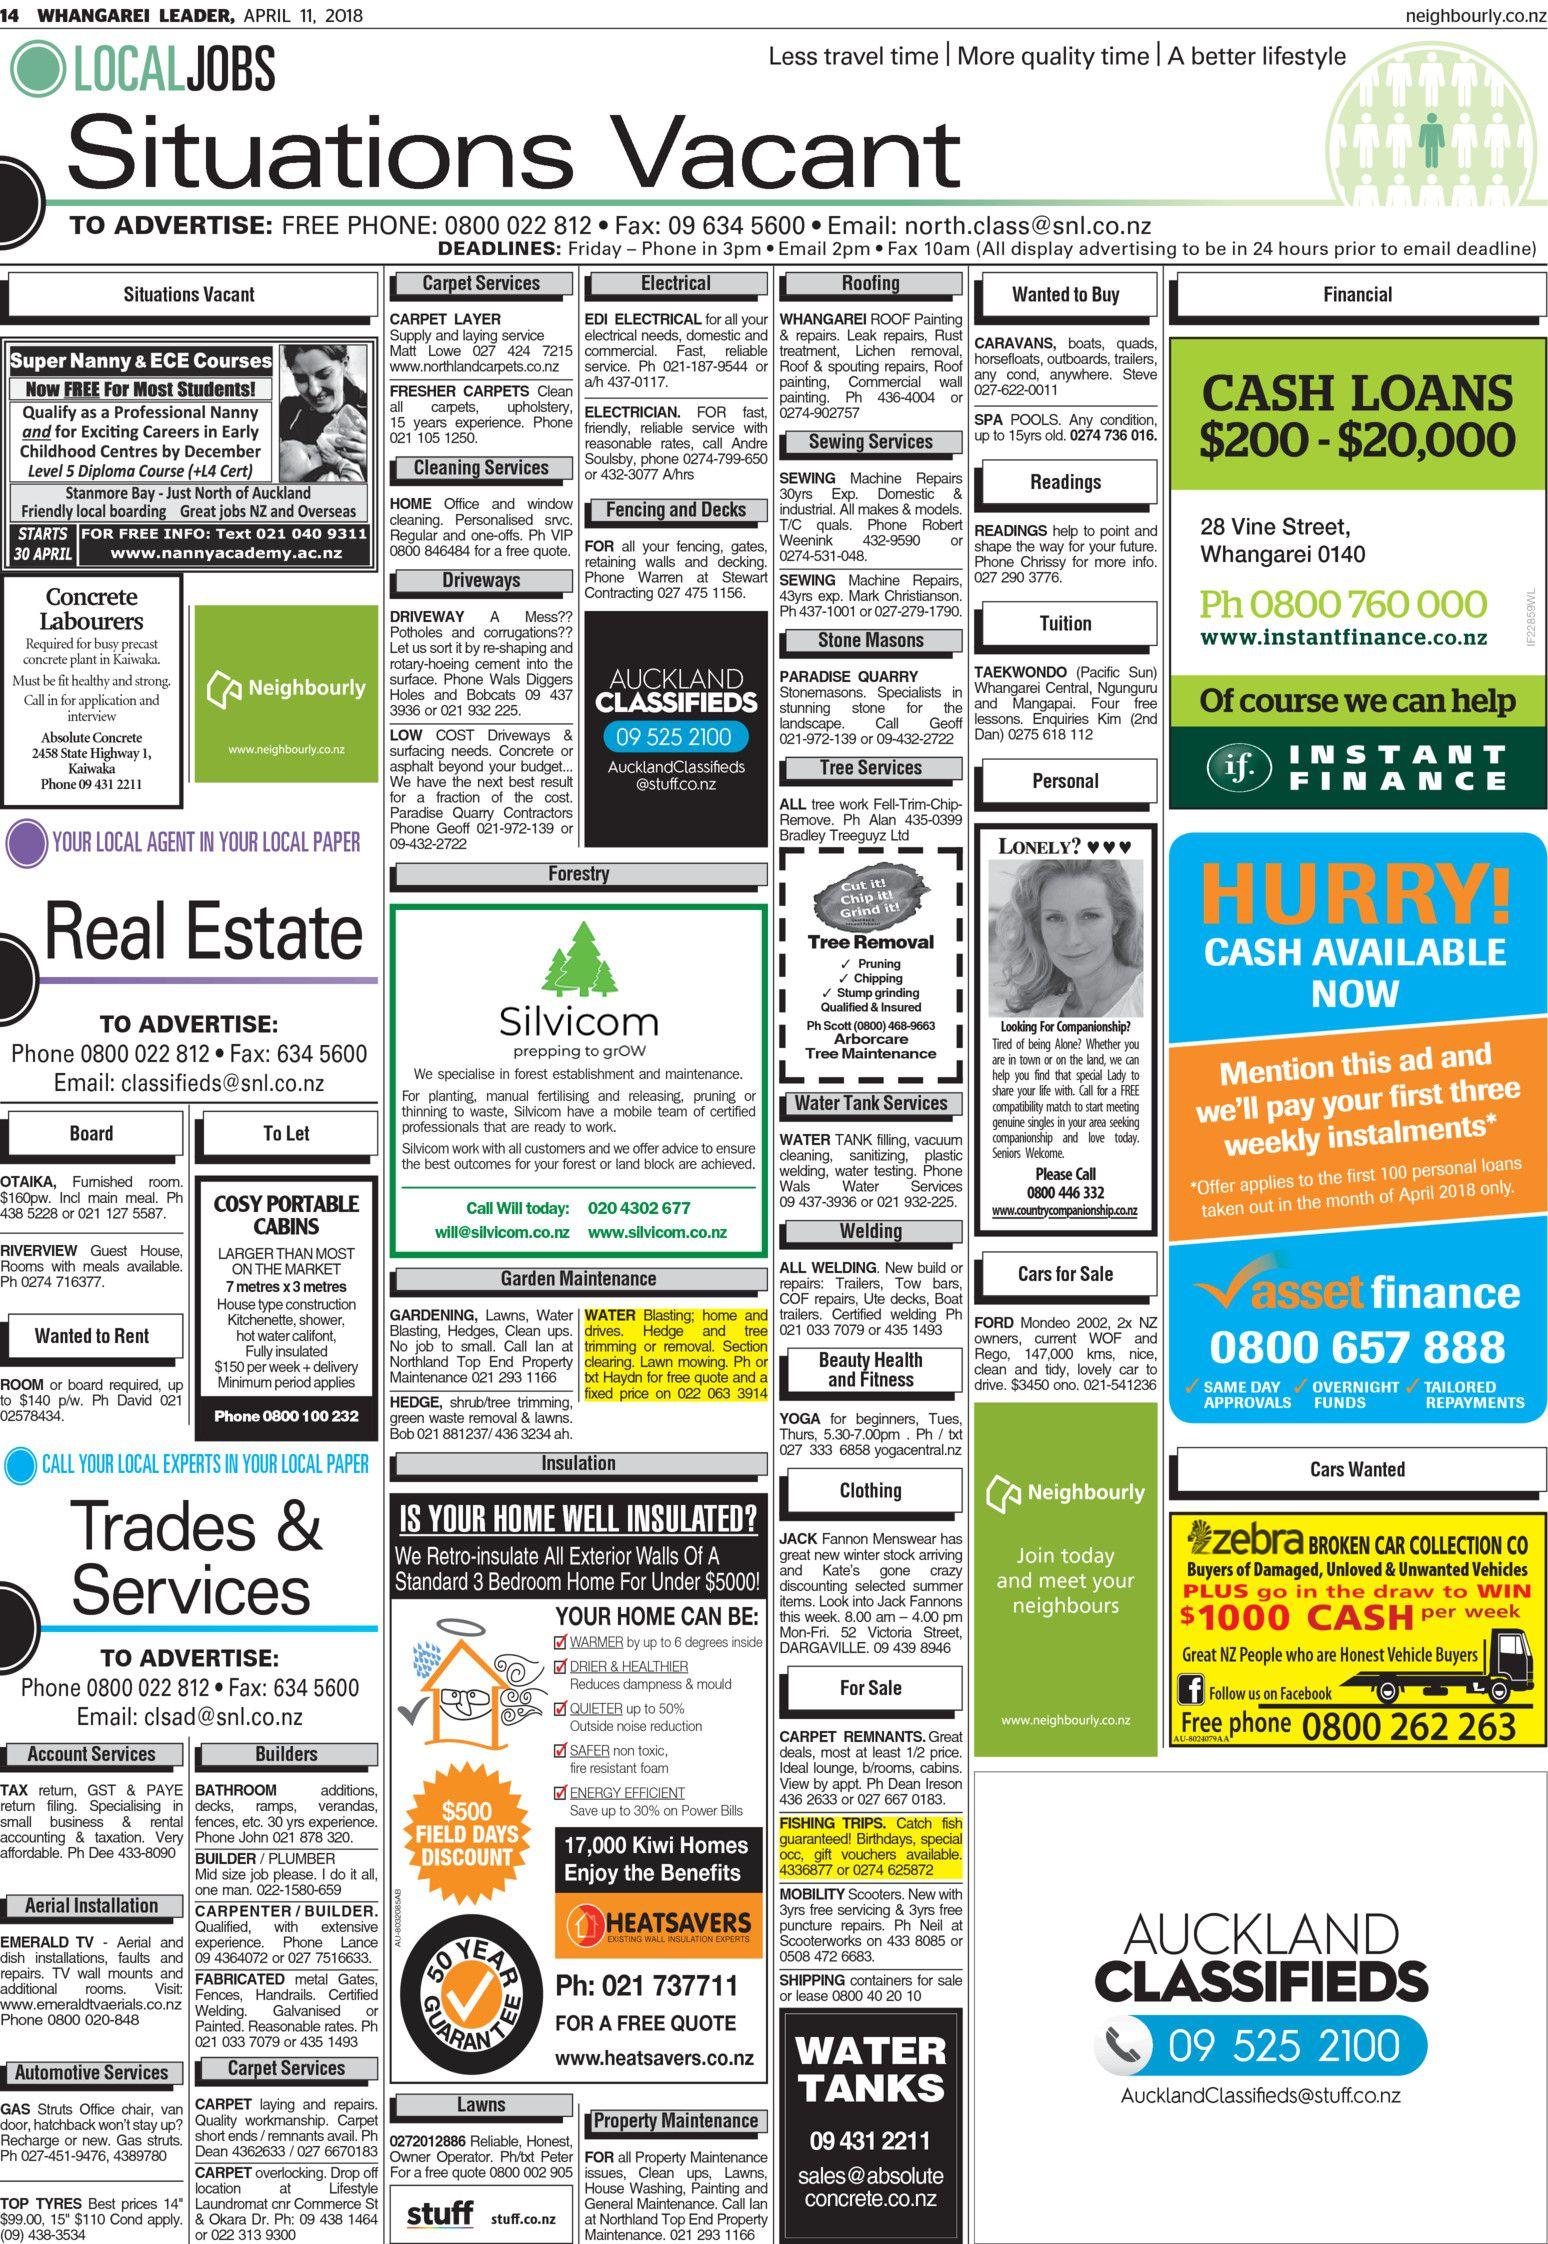 Cash loan places in fredericksburg photo 2